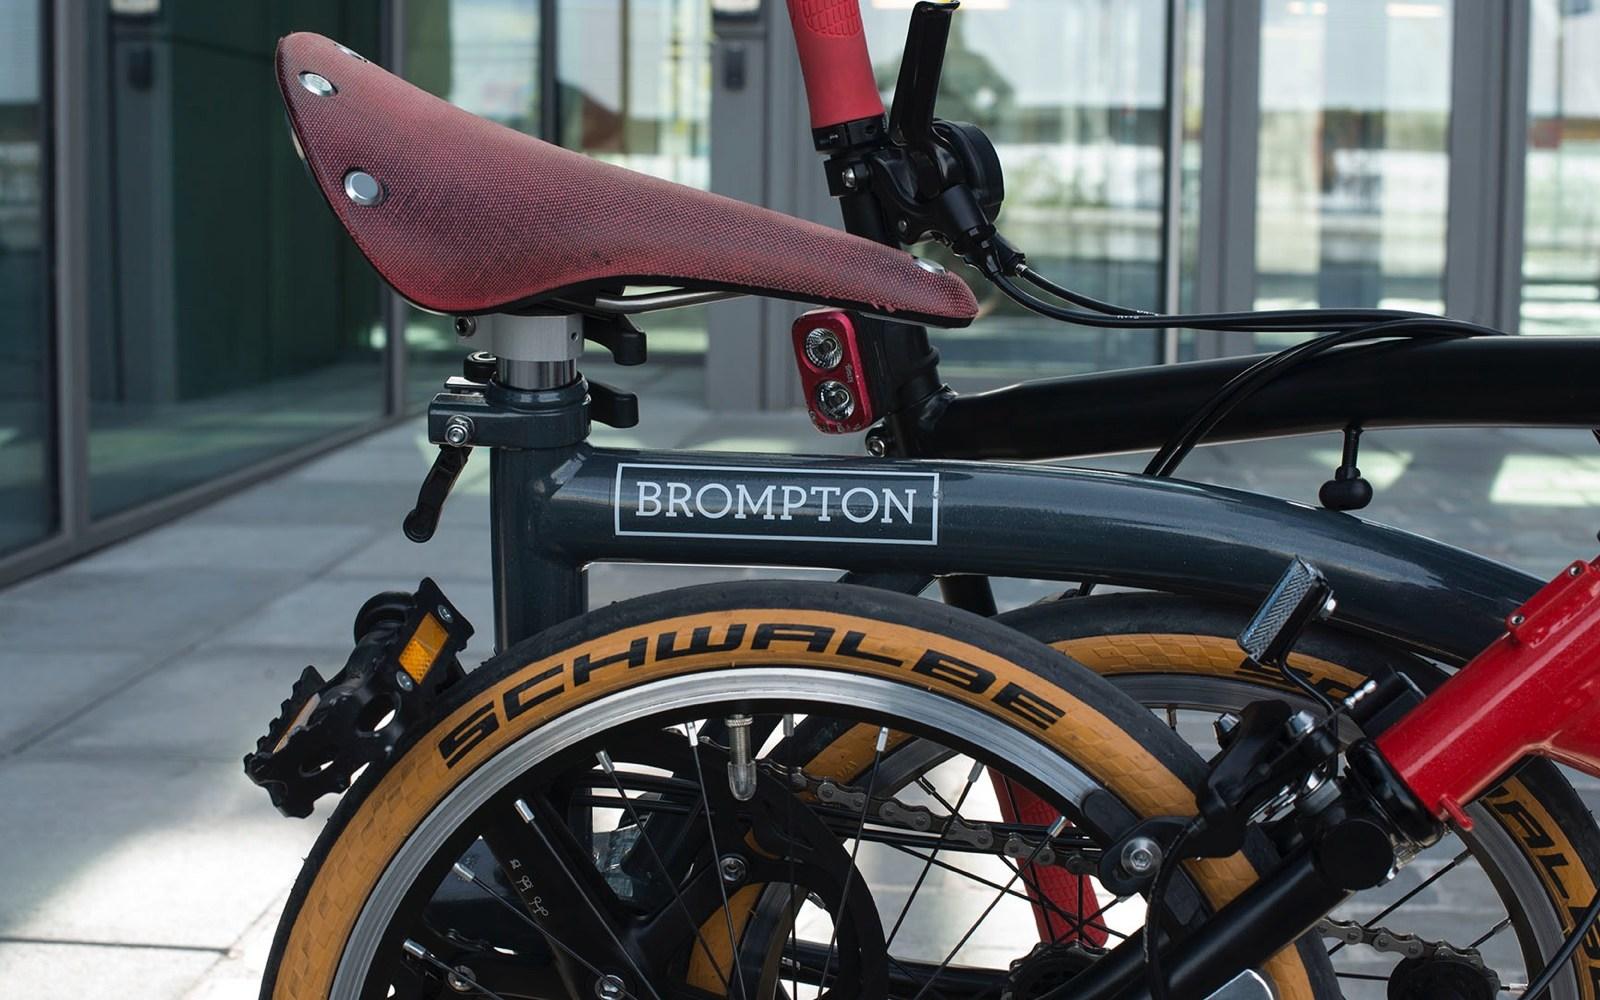 [Test] le vélo pliant Brompton, version CHPT3